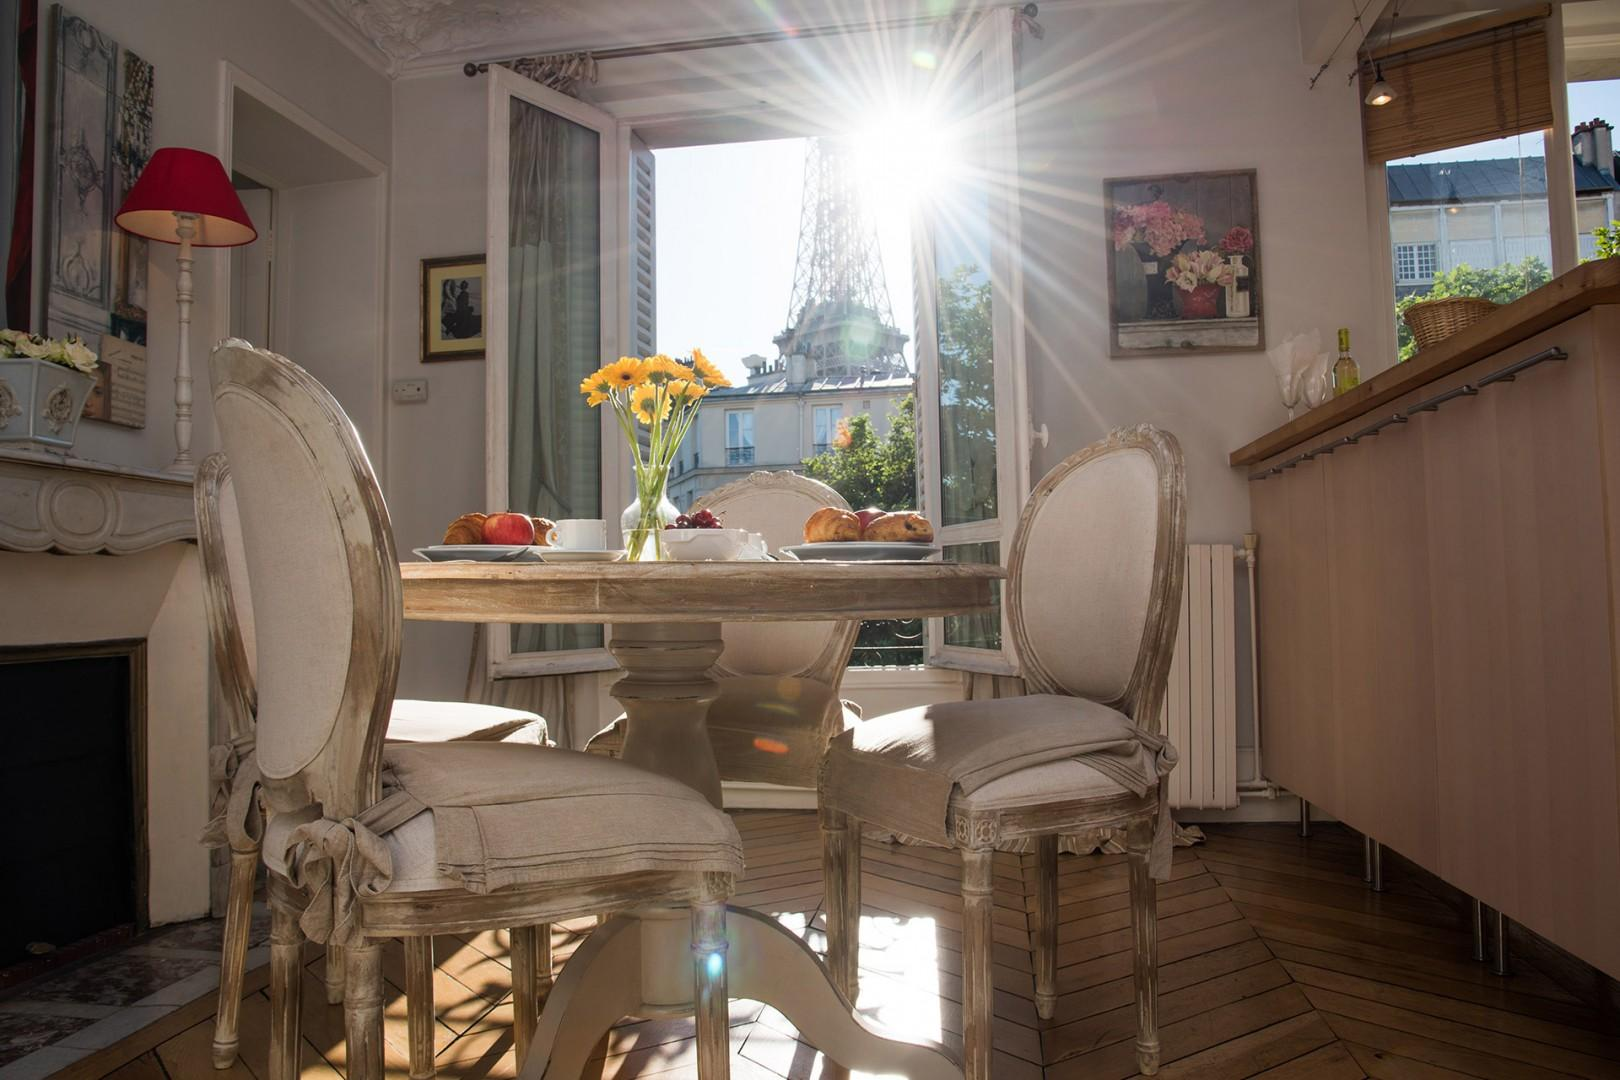 Sunlight streams into the cozy dining room.